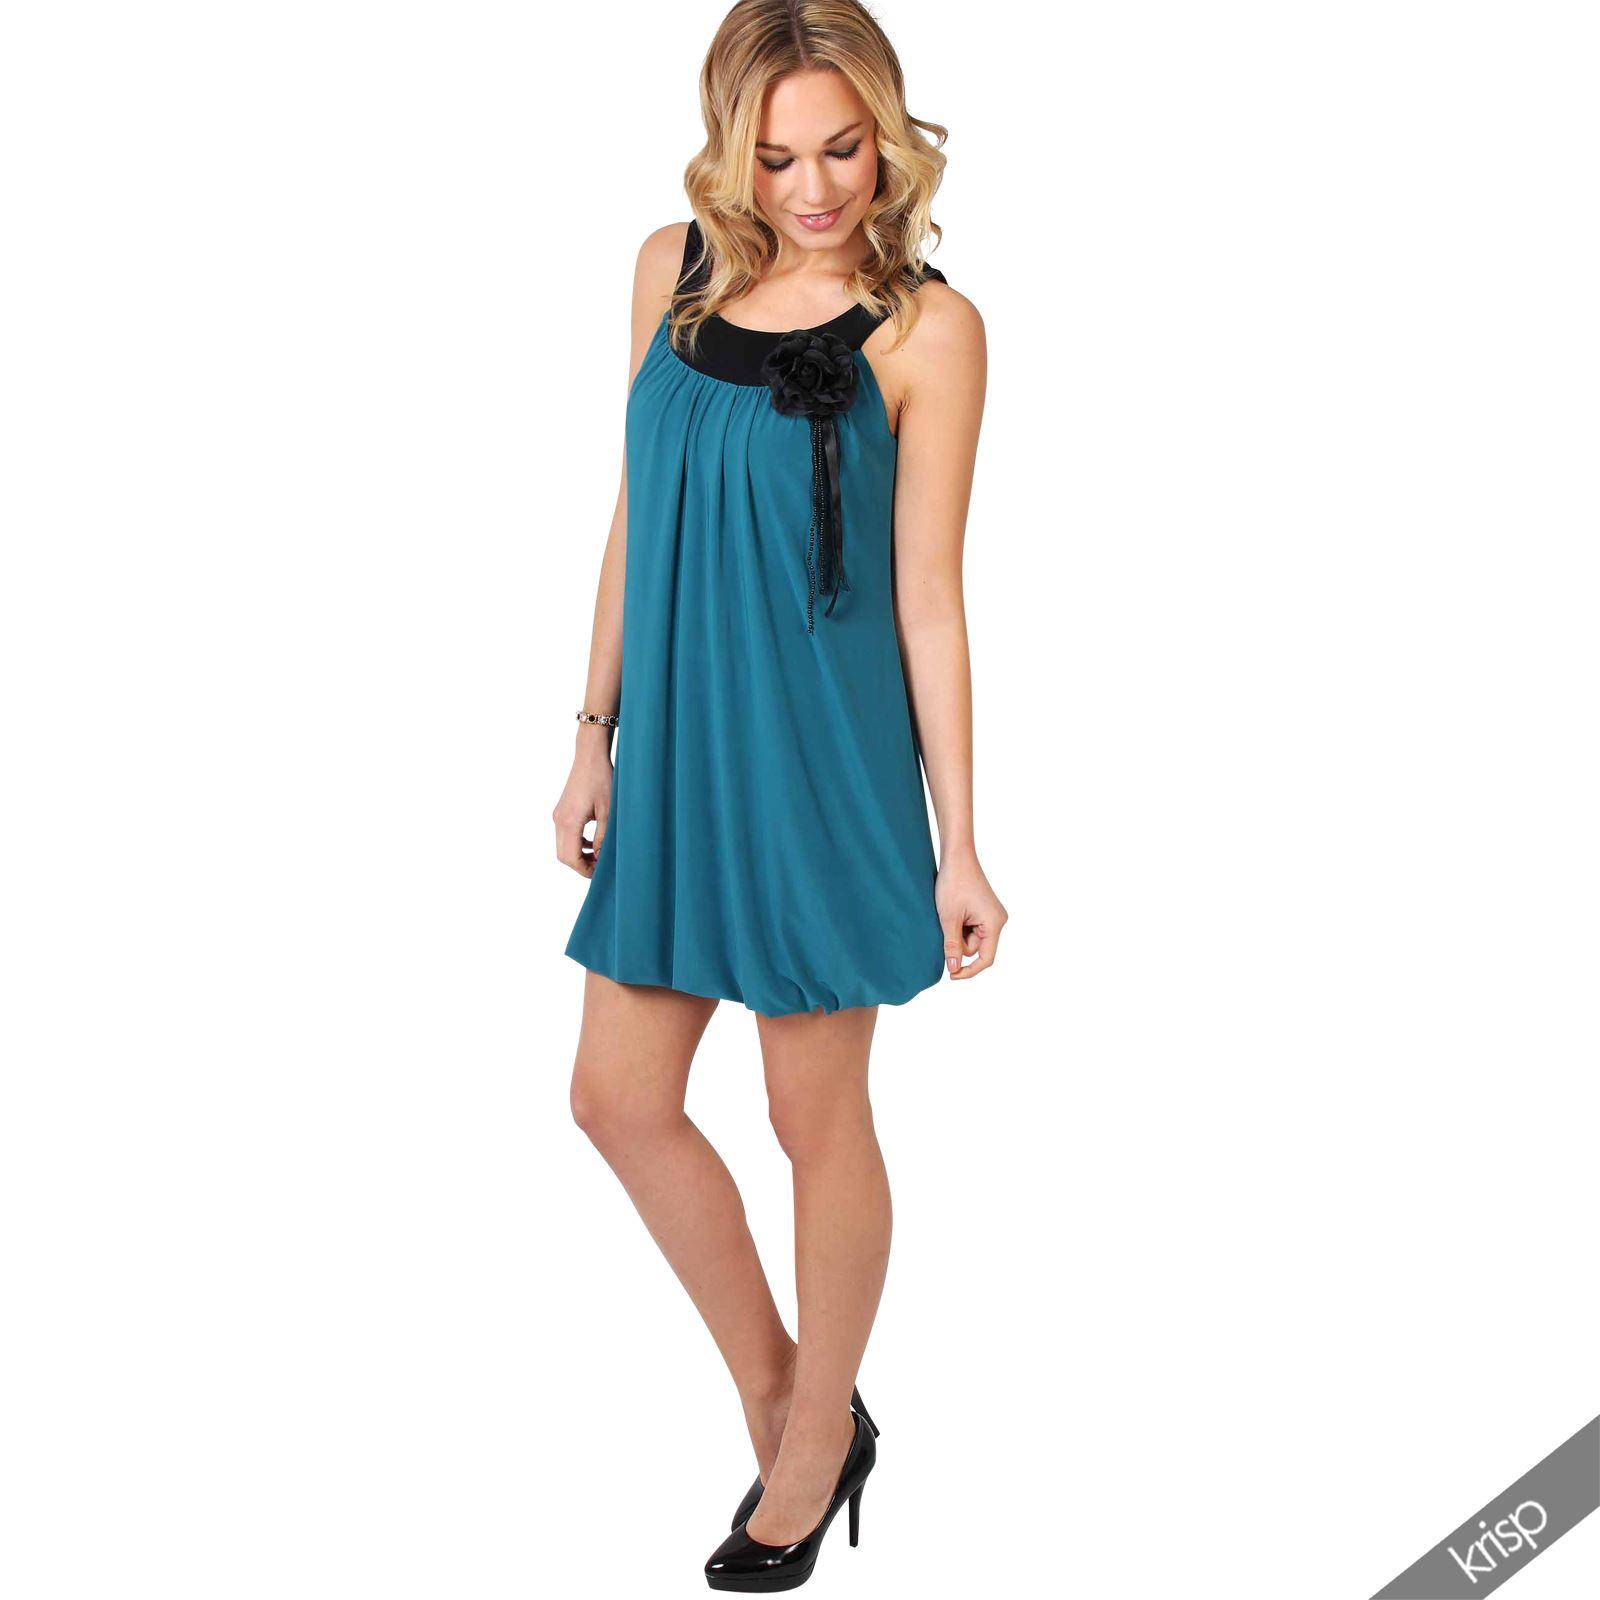 Femmes robe mini courte tunique r tro vintage broche fleurs pliss e ann es 20 39 ebay - Robe vintage annee 20 ...